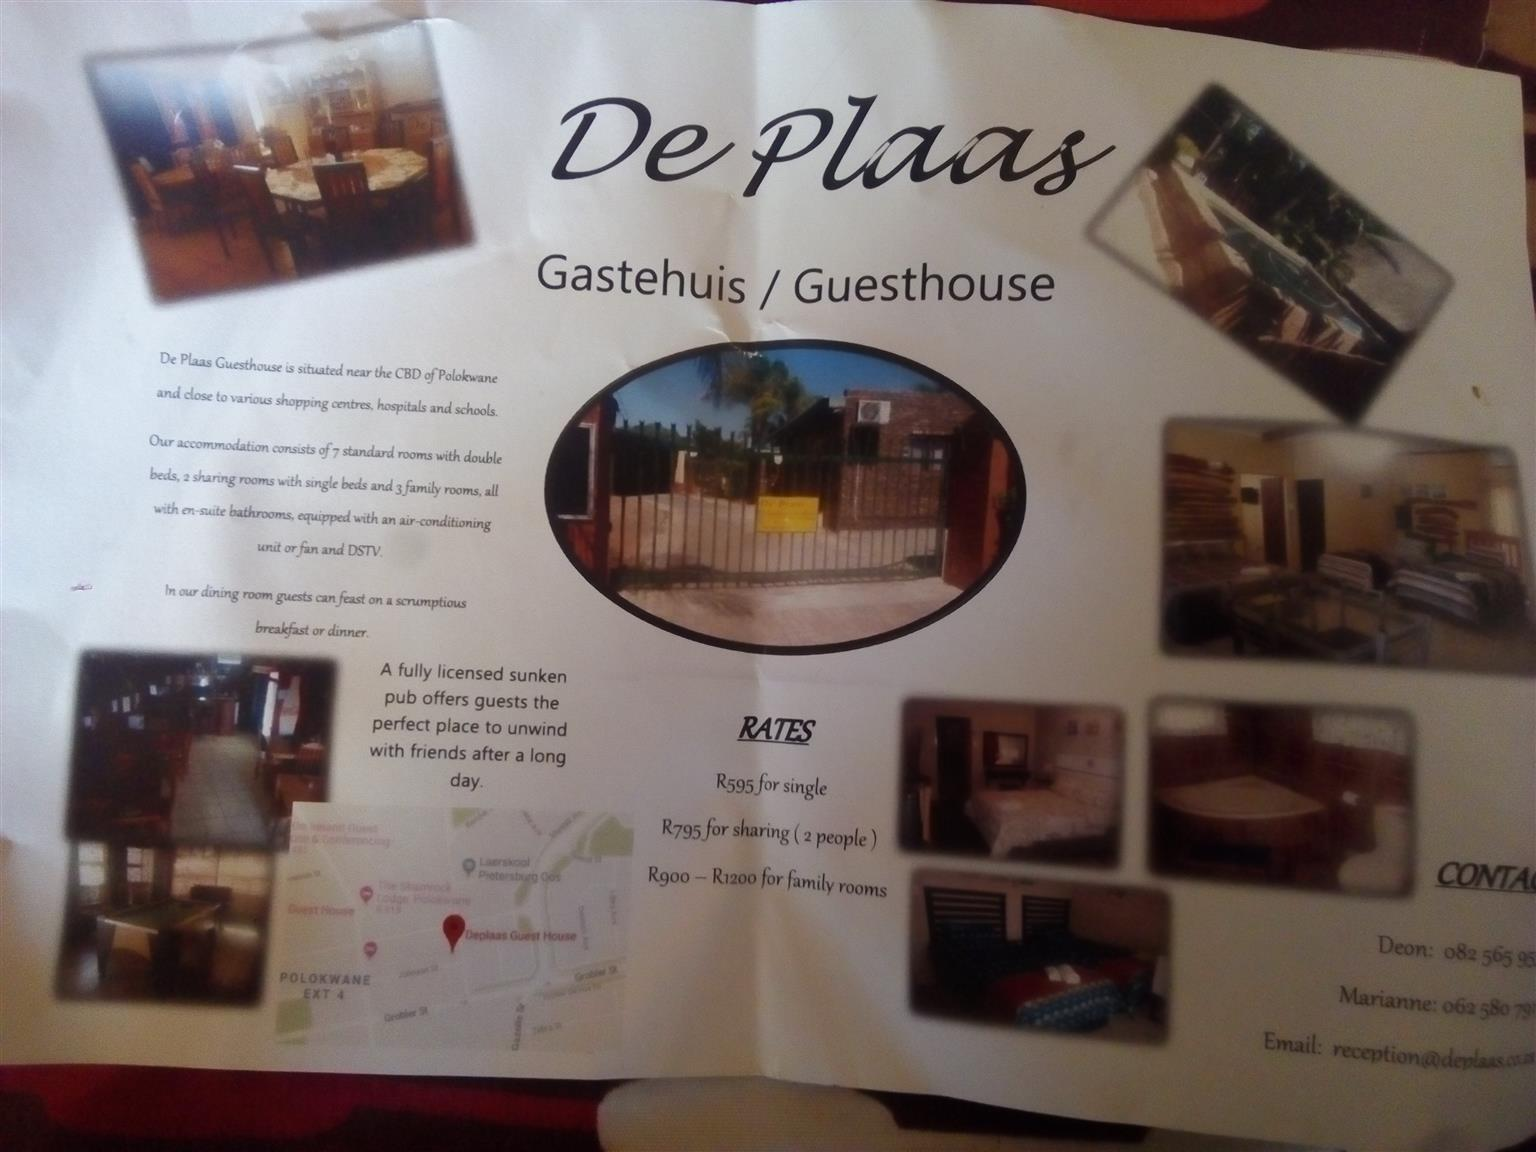 De Plaas Gastehuis Guesthouse